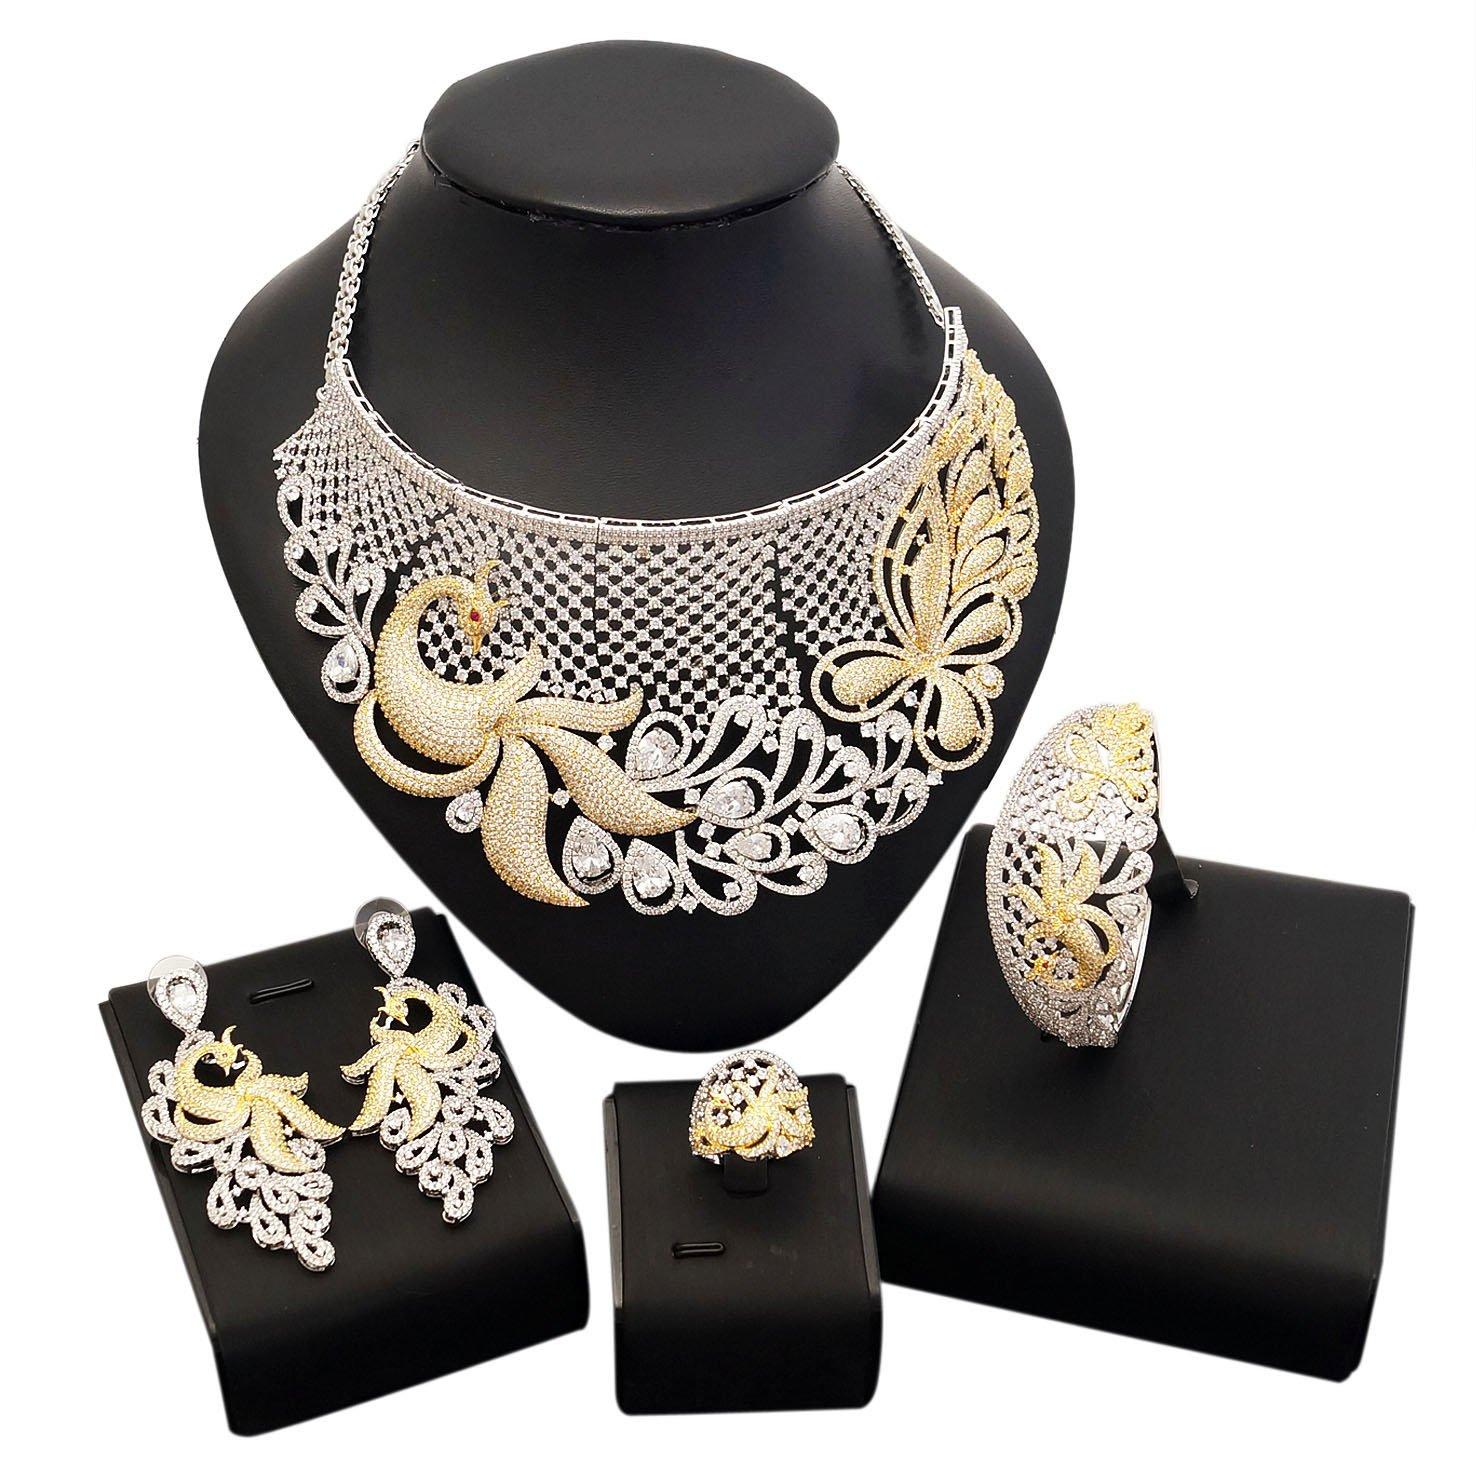 American Diamond Jewelry Set Earrings Costume Necklace Rings Saudi Ethiopian Women Bride Wedding Girls Nigerian Zircon Dubai 18k Gold Plated Filled Fashion African Indian Cubic Zirconia Bridal